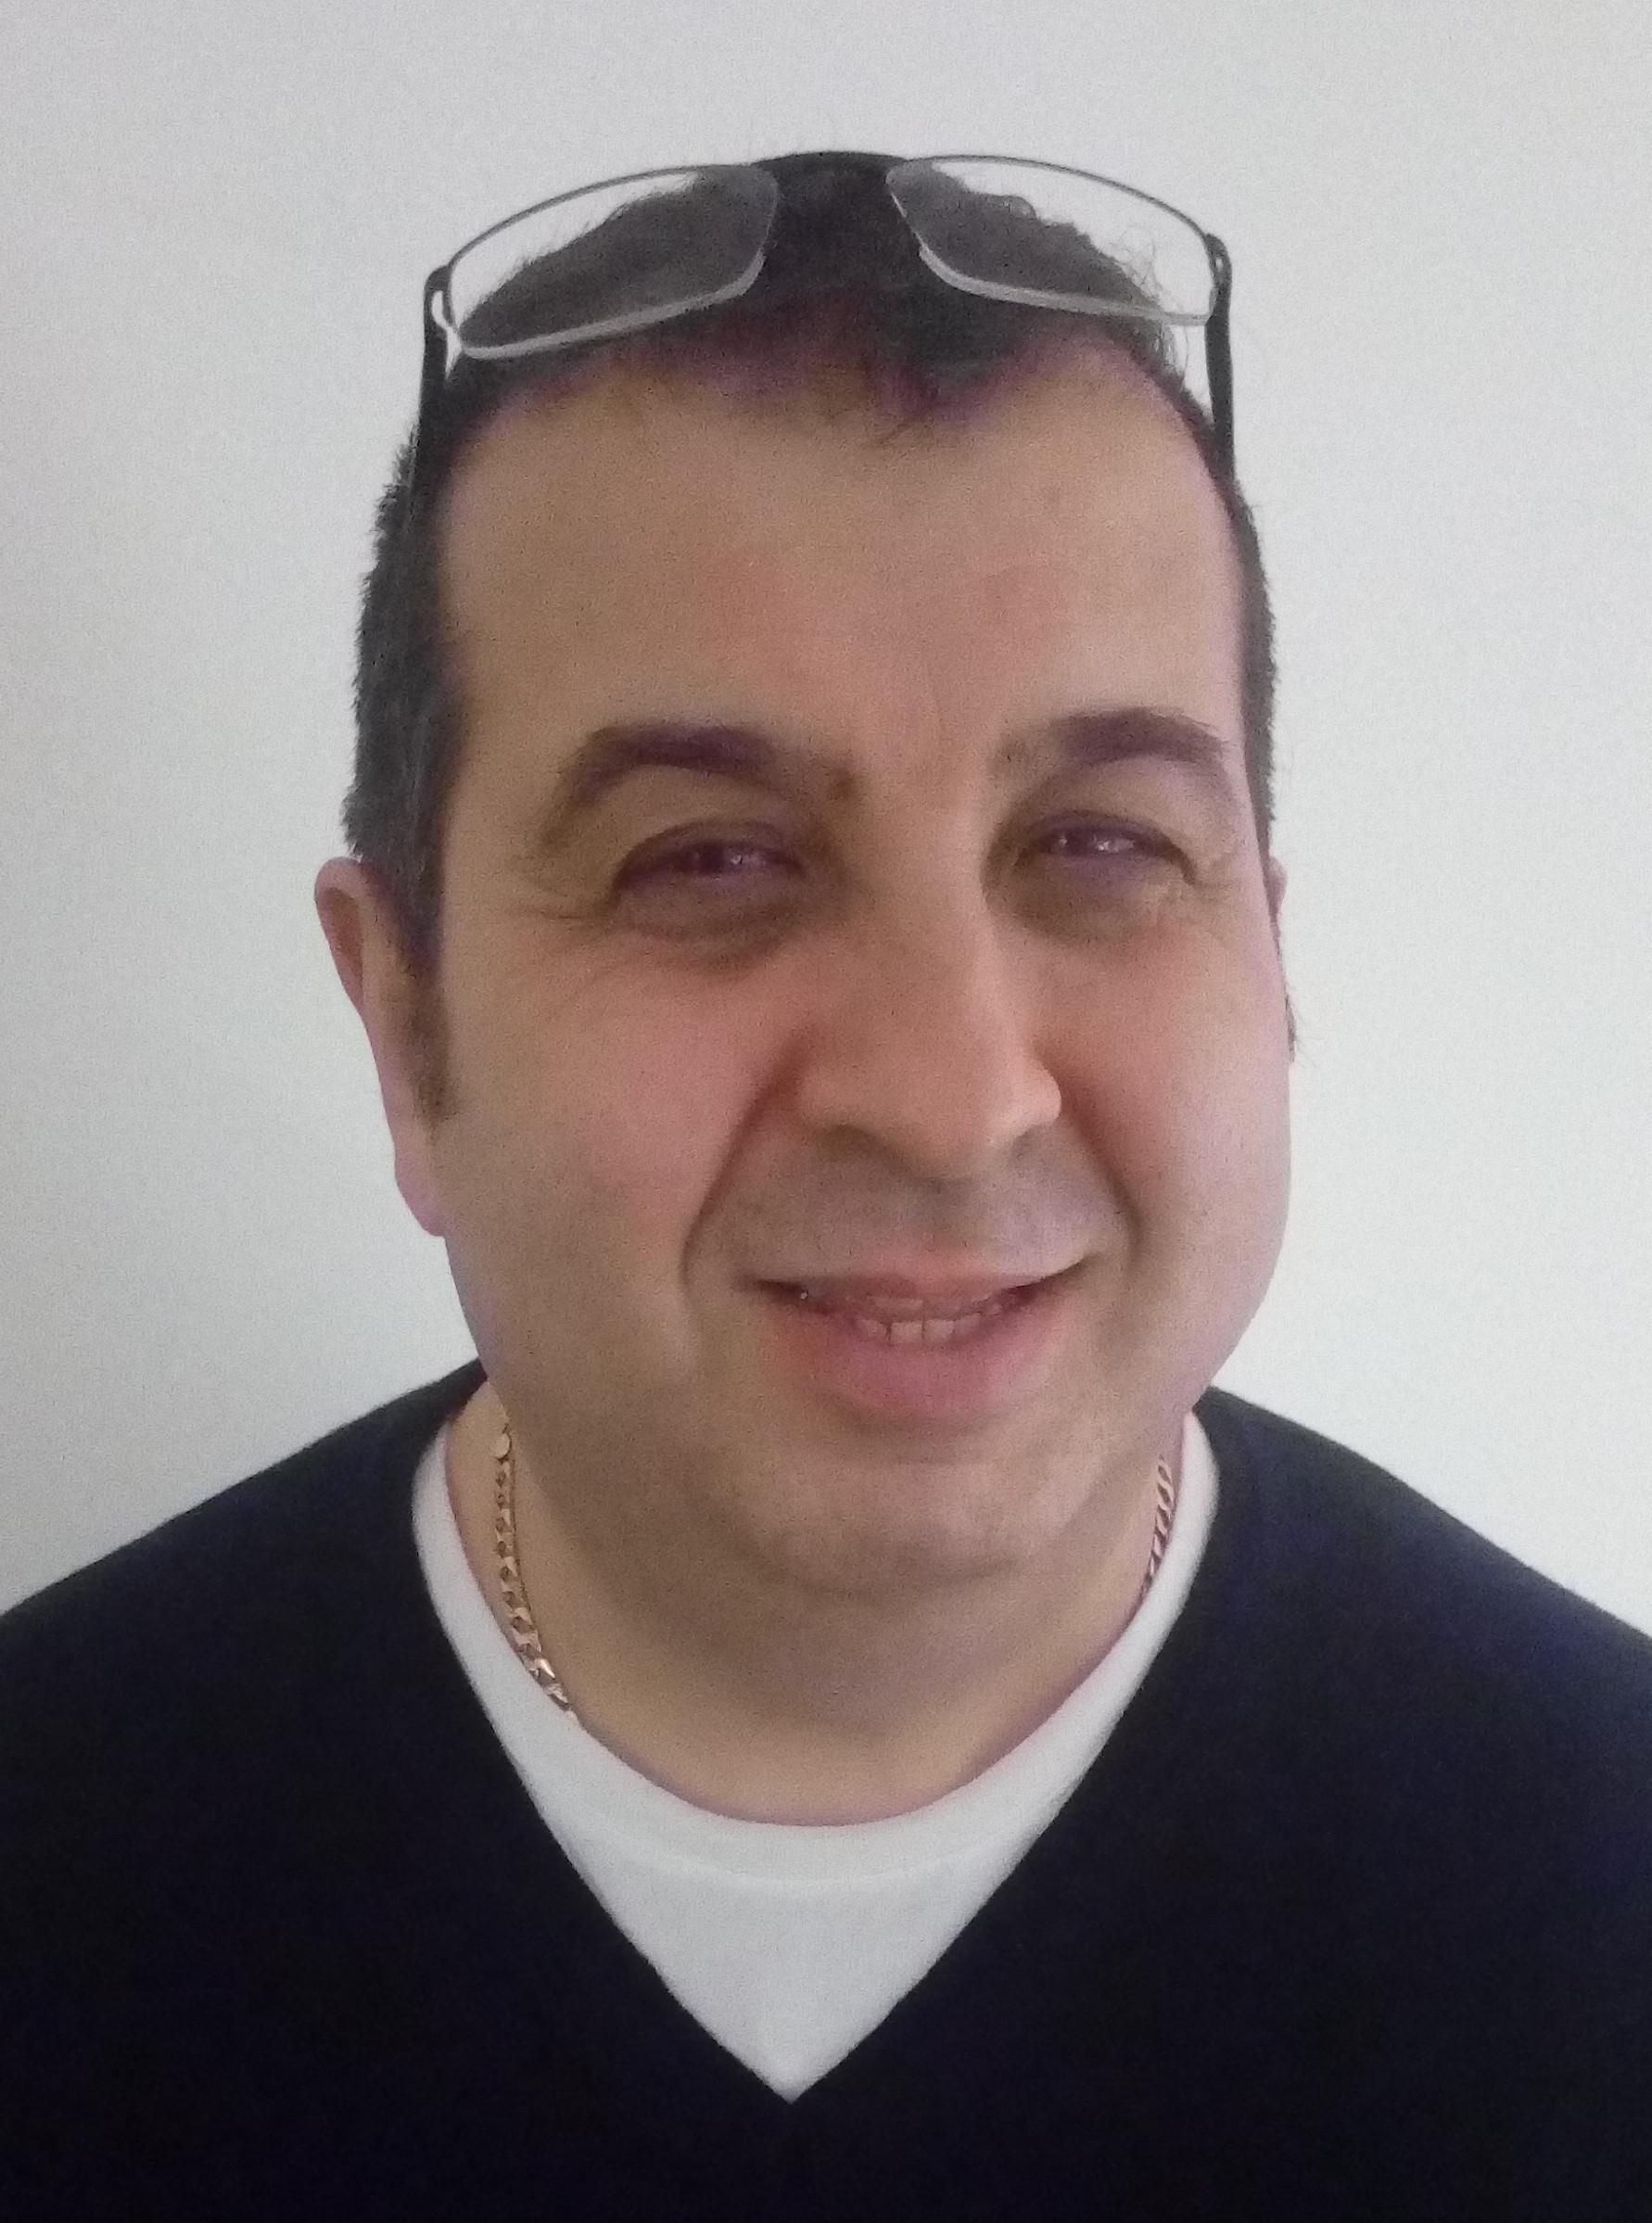 Bilde av Iannella, Nicolangelo Libero